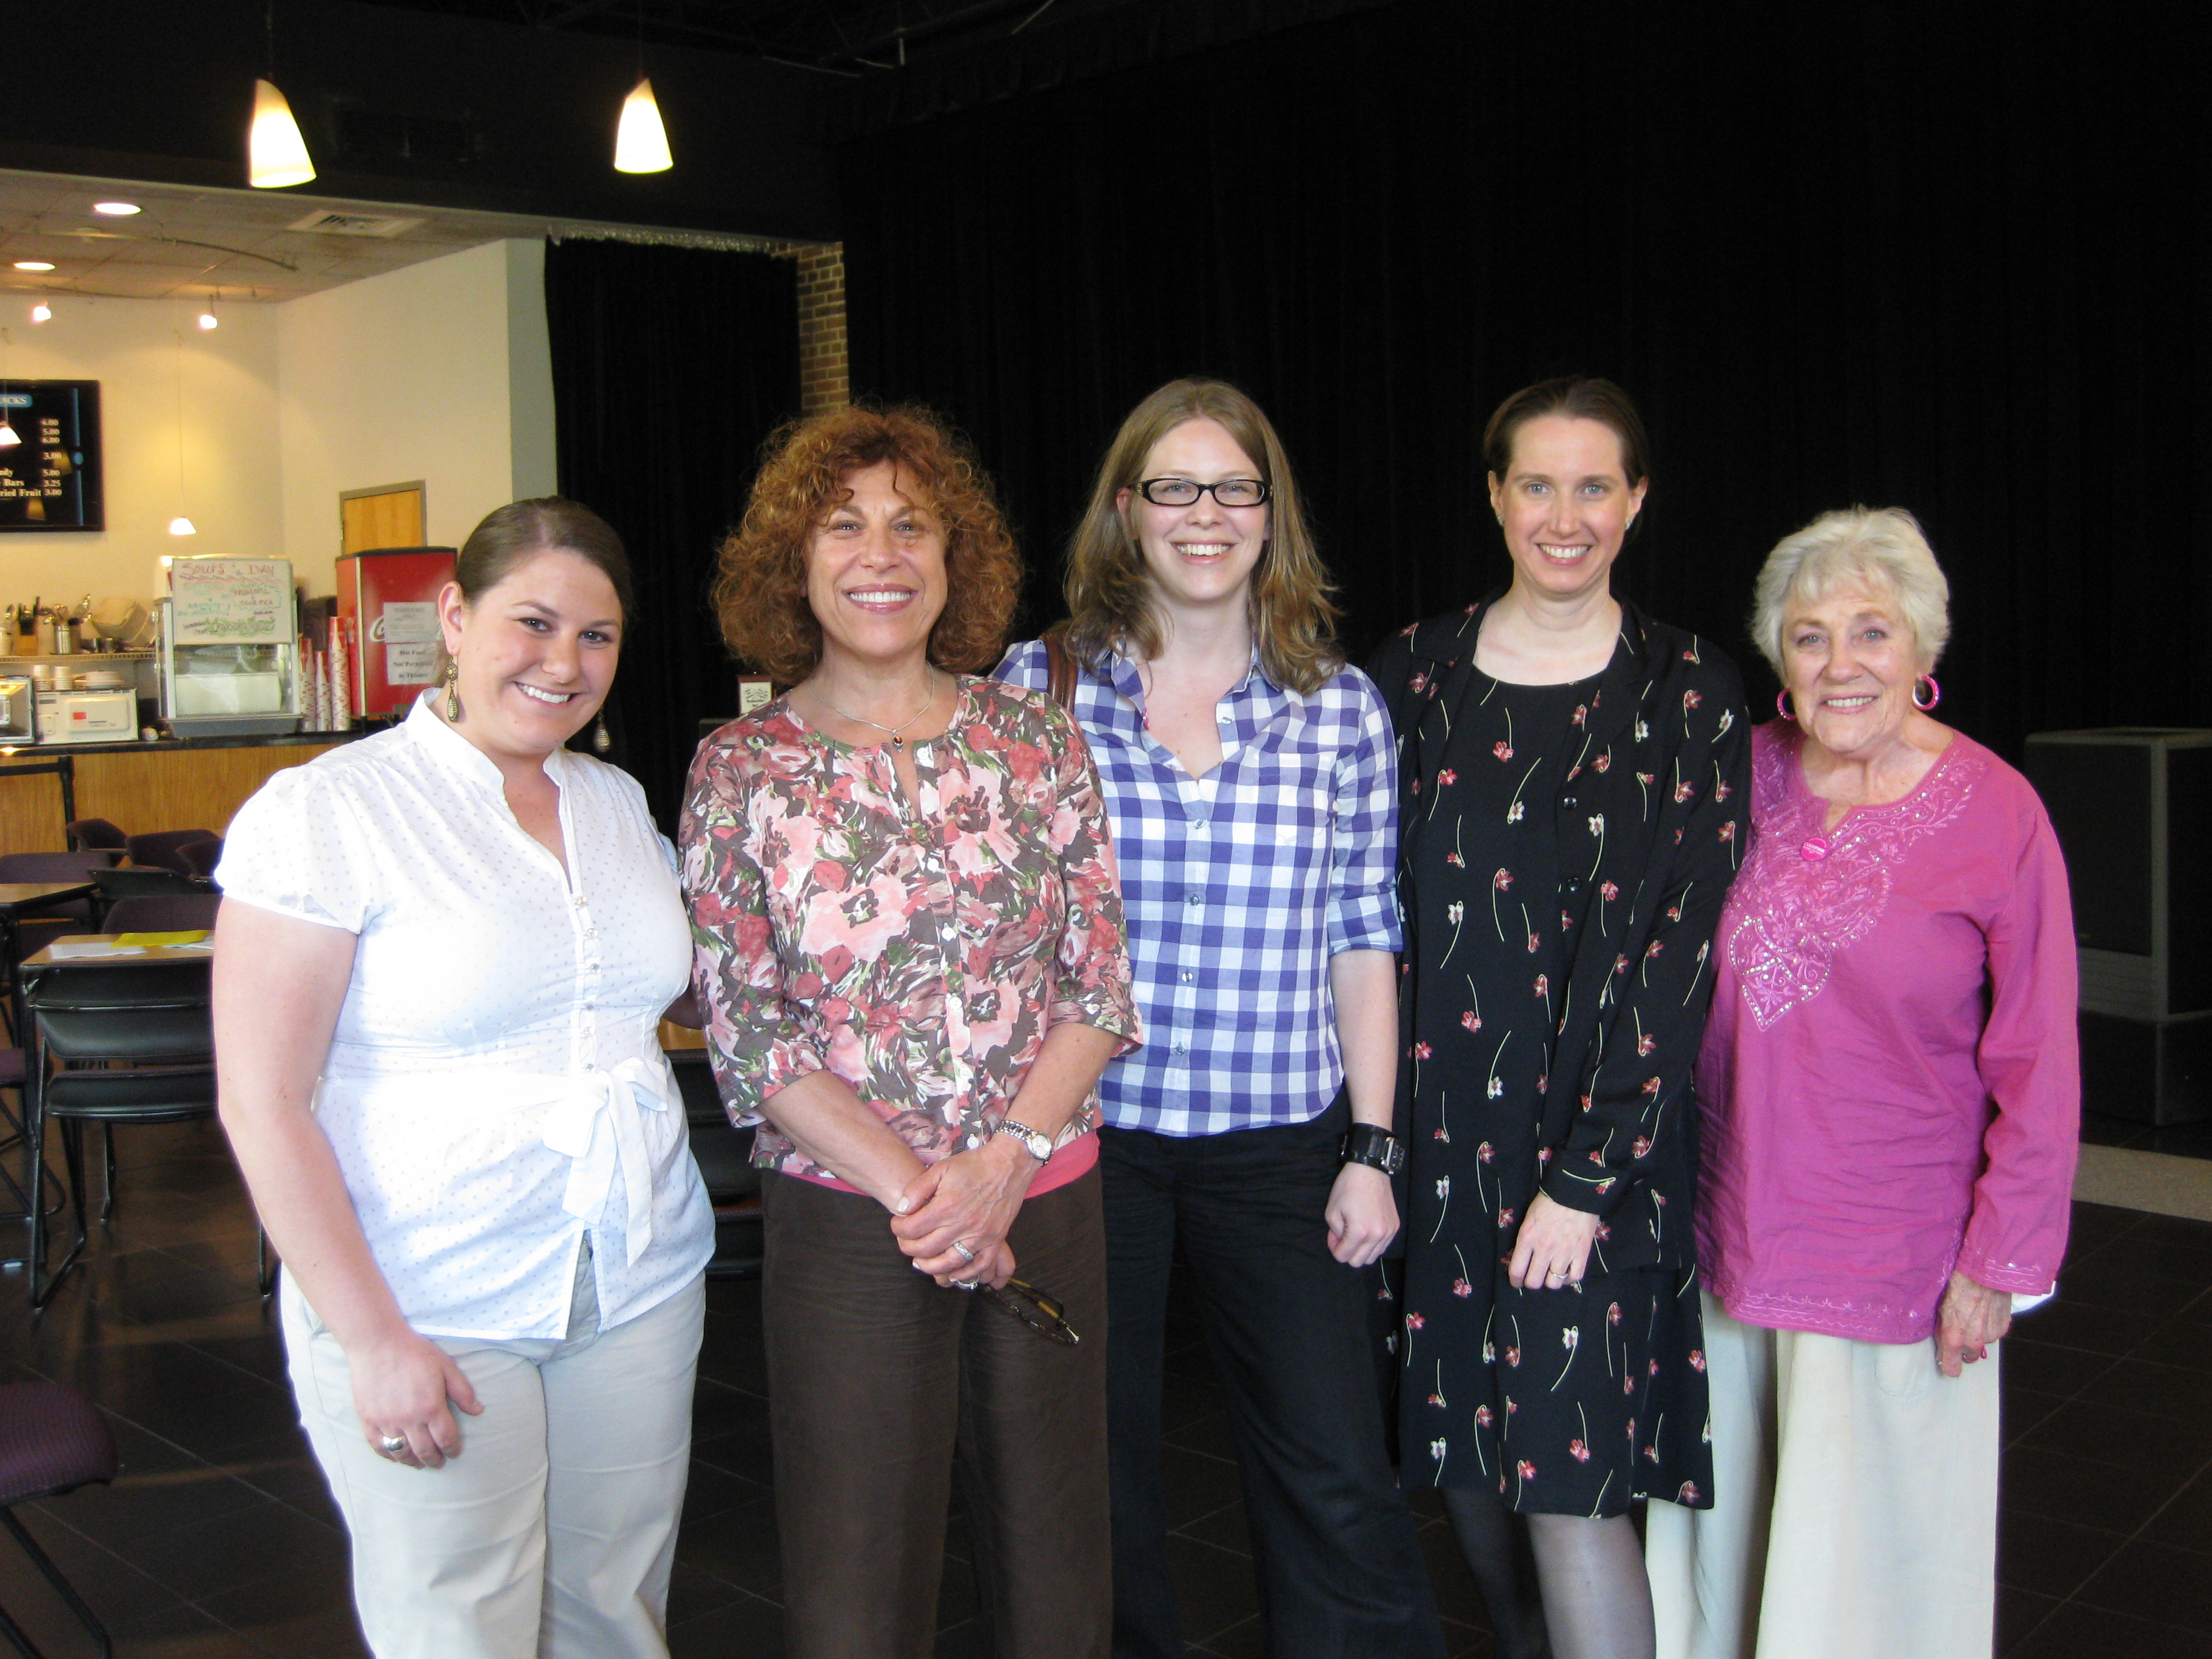 Andrea Callan, Hedda Marcus, Lina Olsson, Kimberly Wilder, Charlotte Koons